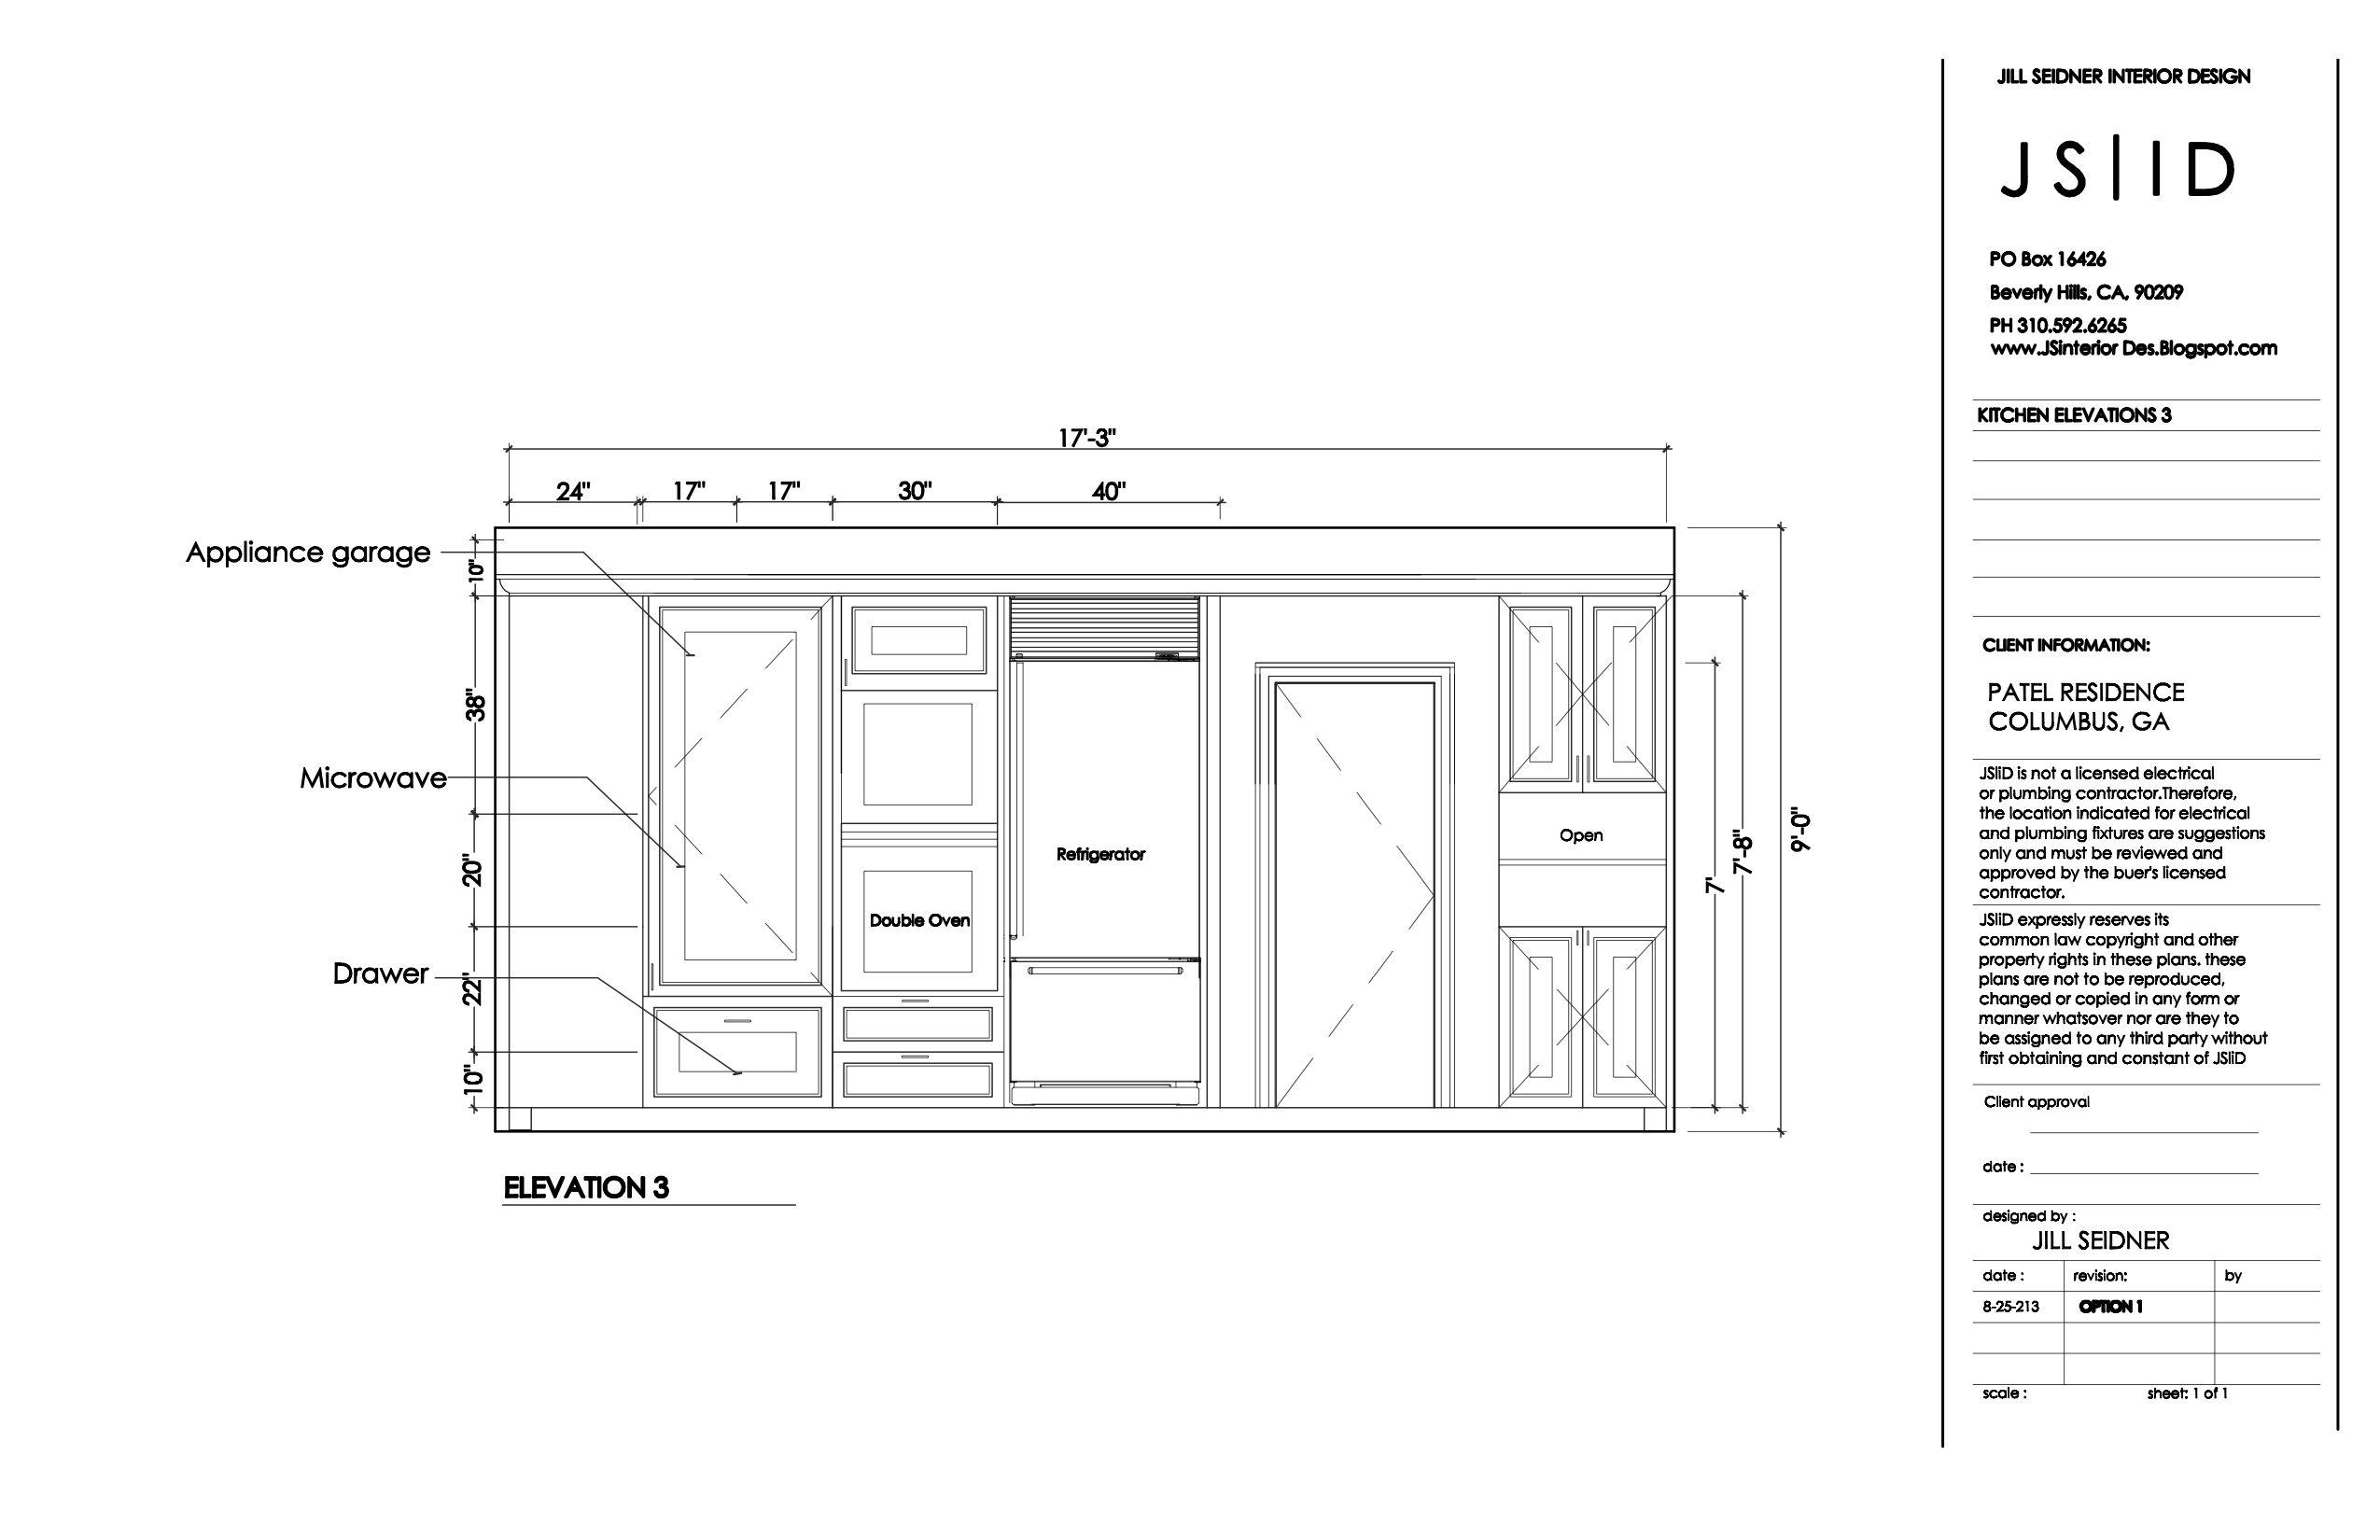 Columbus, GA Kitchen Remodel Elevation Drawing. www.JSInteriorDes ...